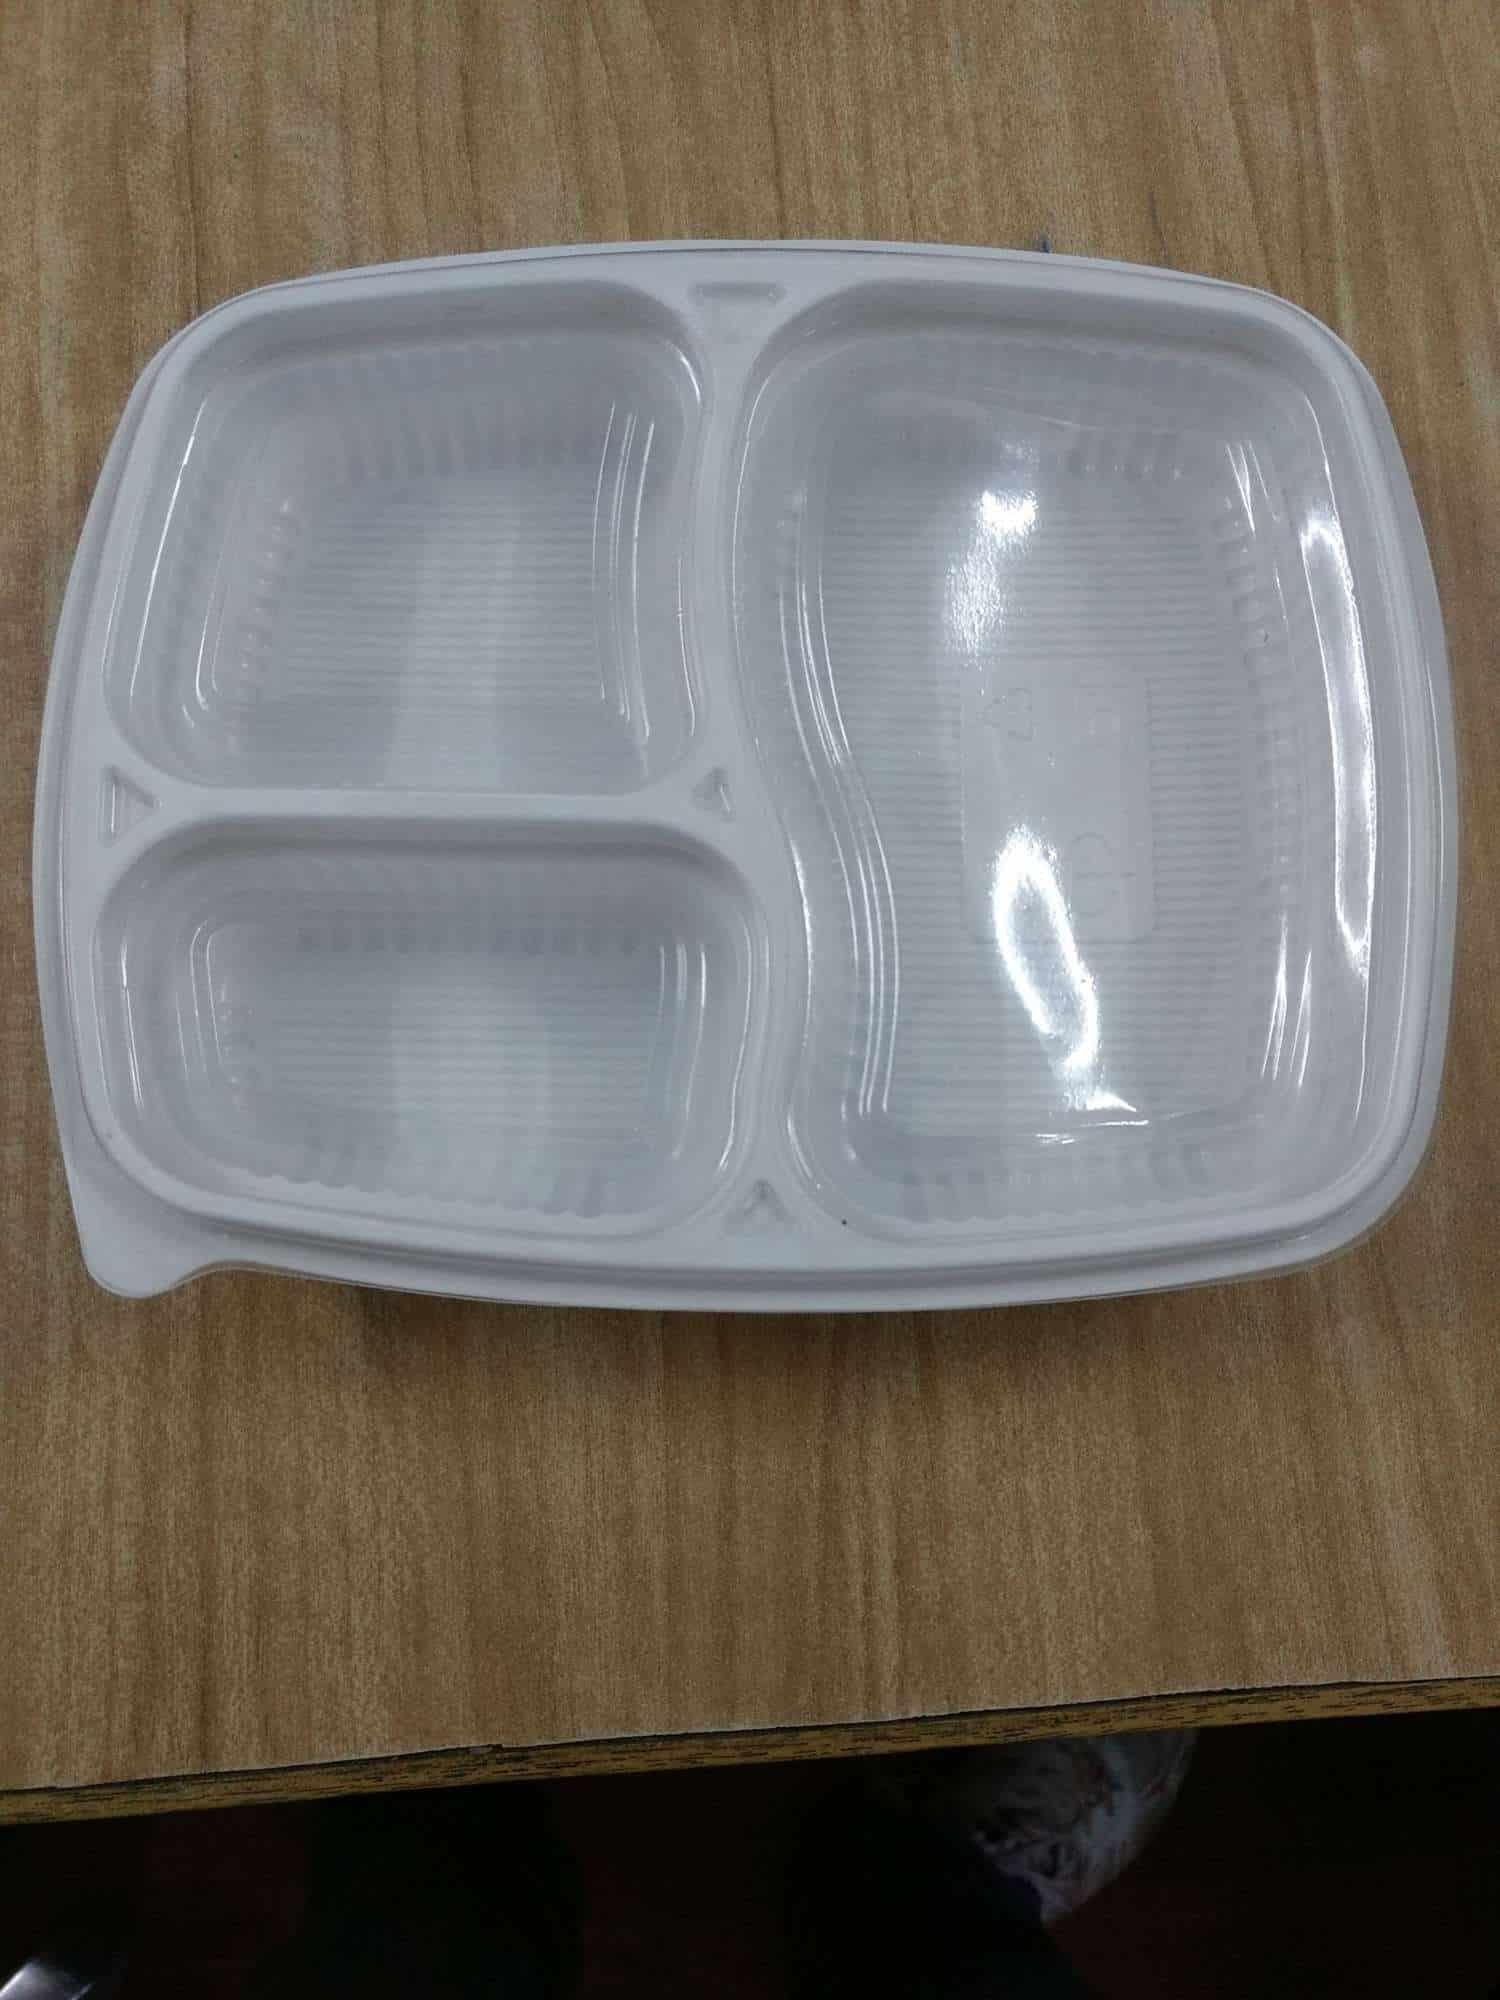 Solutions Gurgaon, Sohna Road - Disposable Product Dealers in Delhi ...